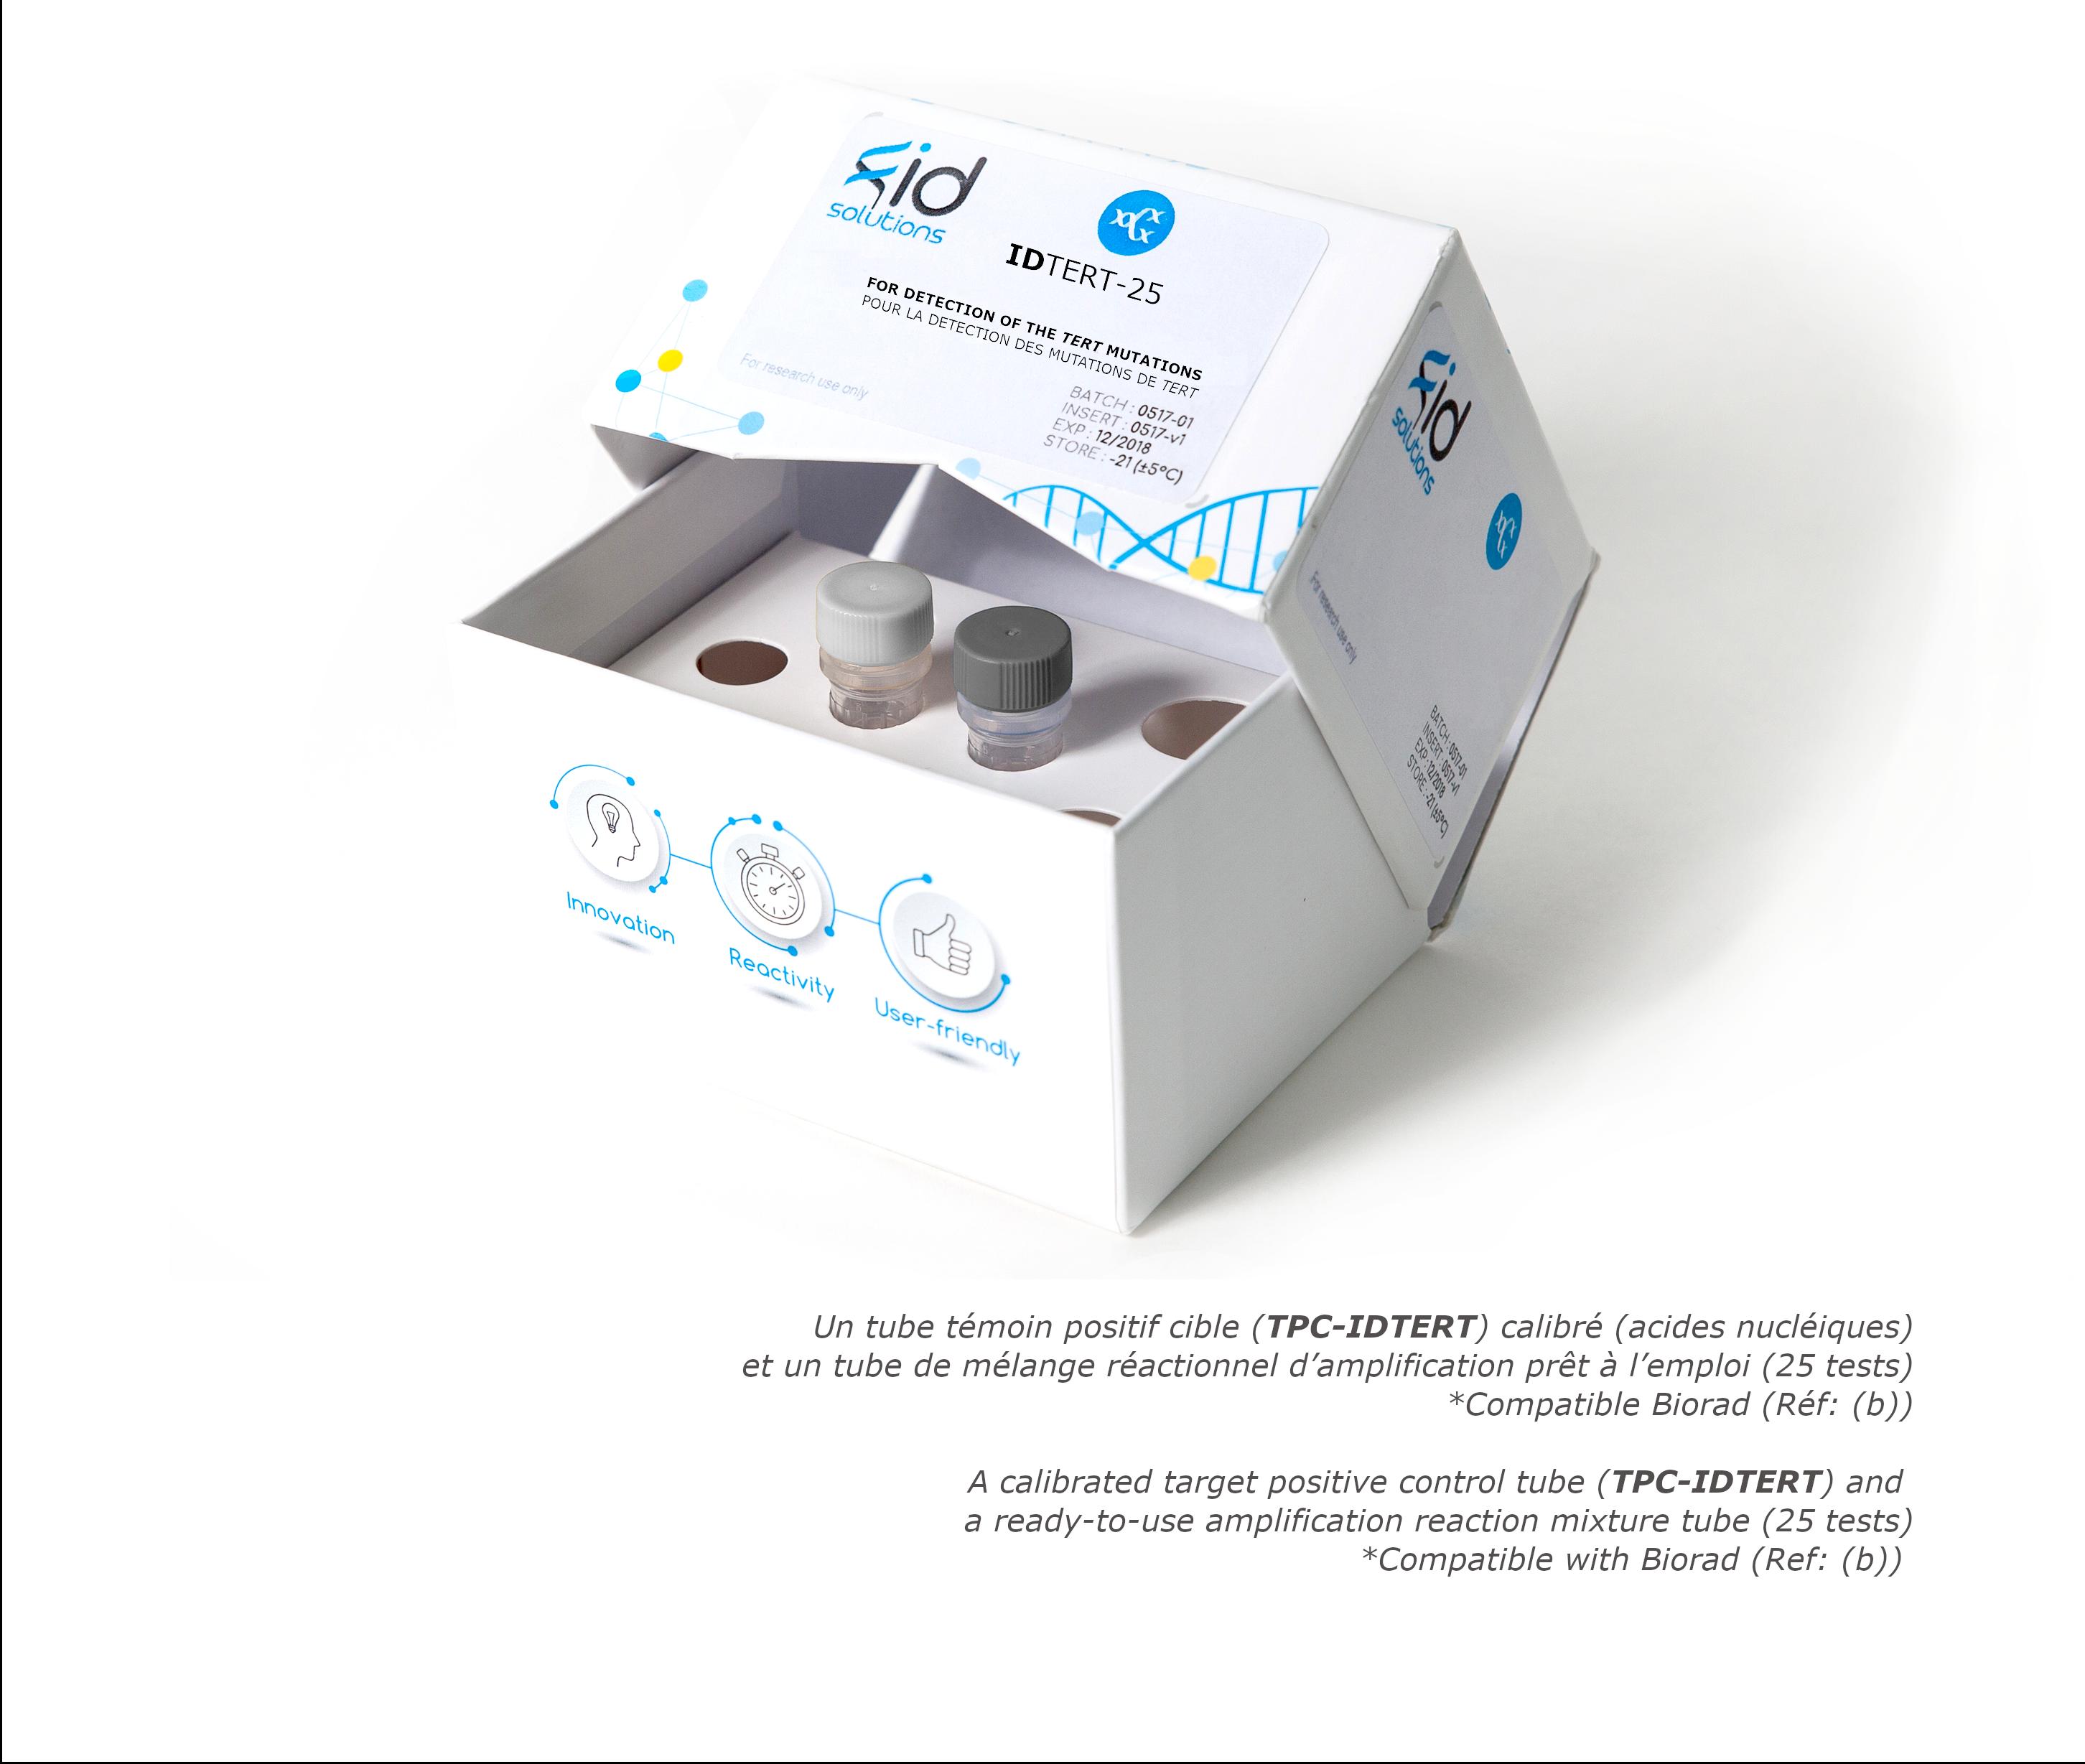 IDTERT- circulating Tumor DNA TERT Mutation Detection Kit based on digital PCR